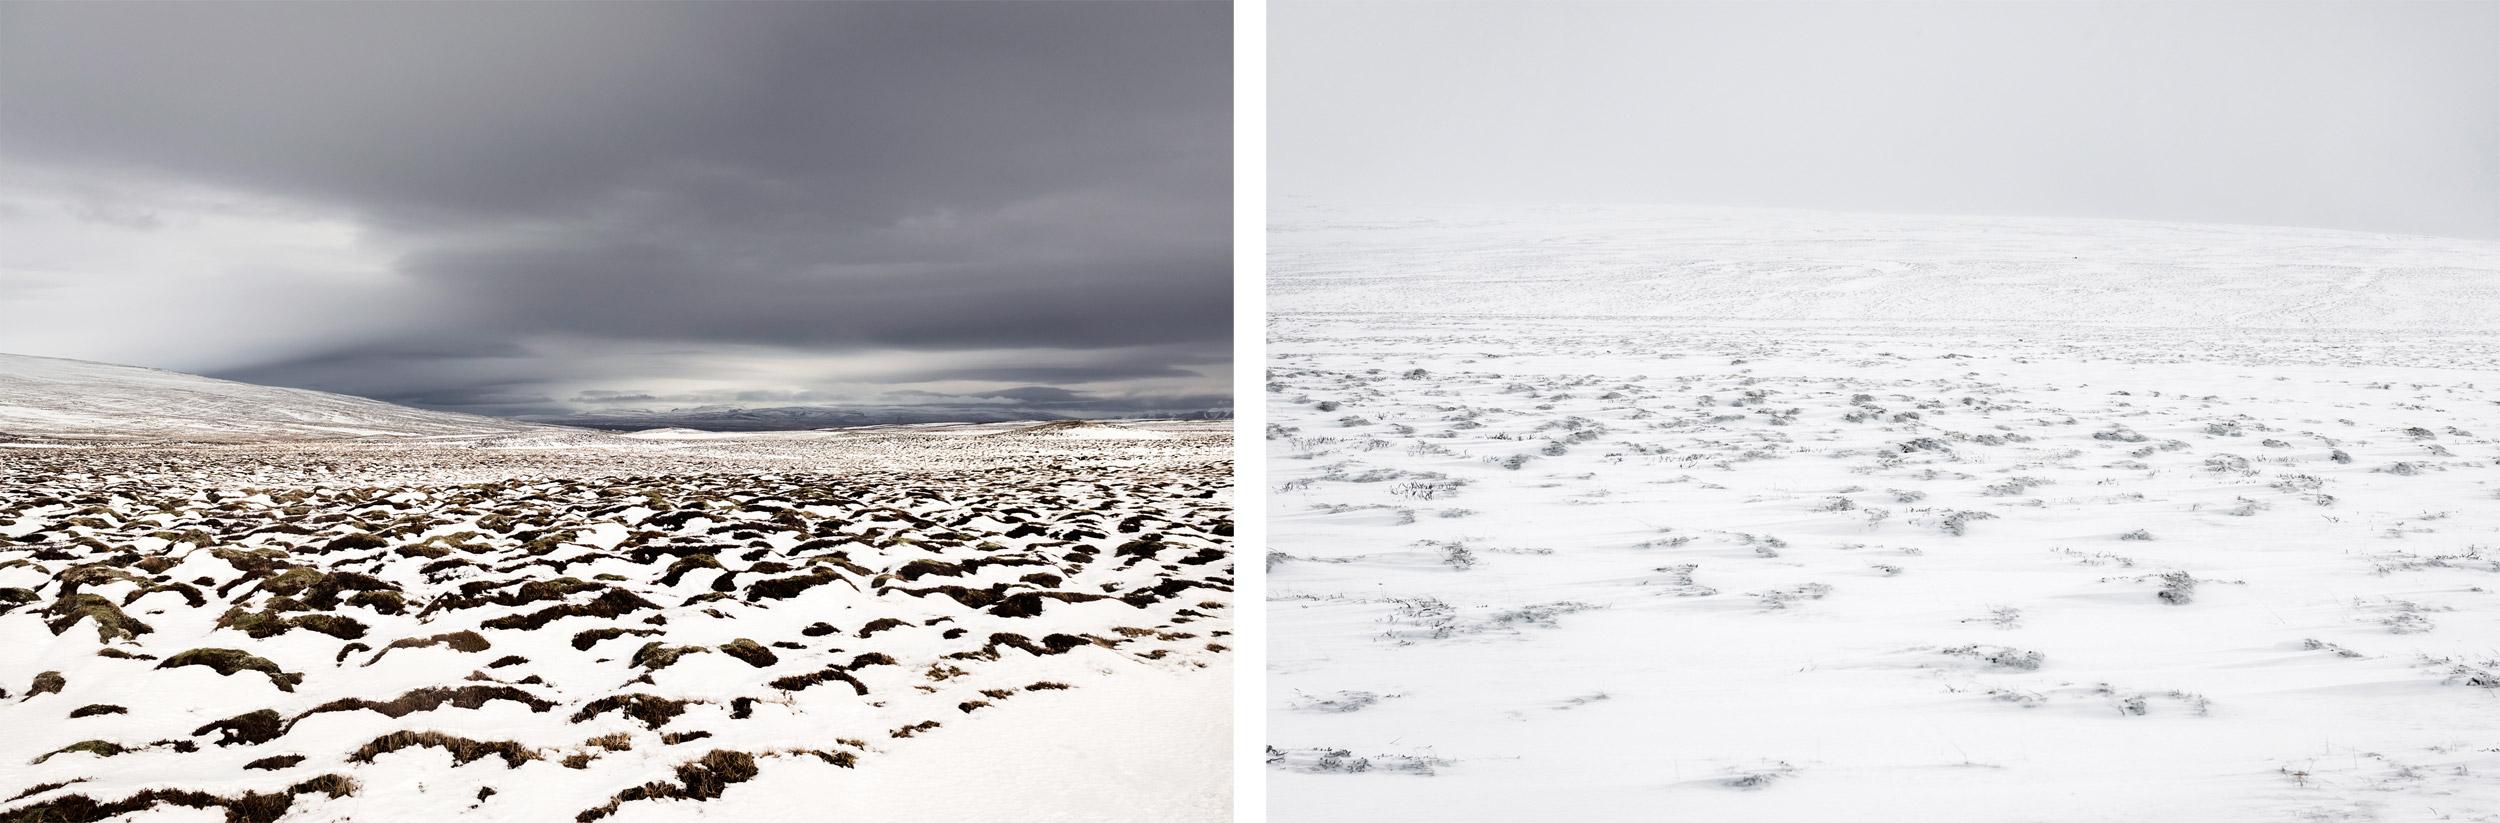 Voyage_Islande_Hiver_Anouk-Ruffieux_29.jpg